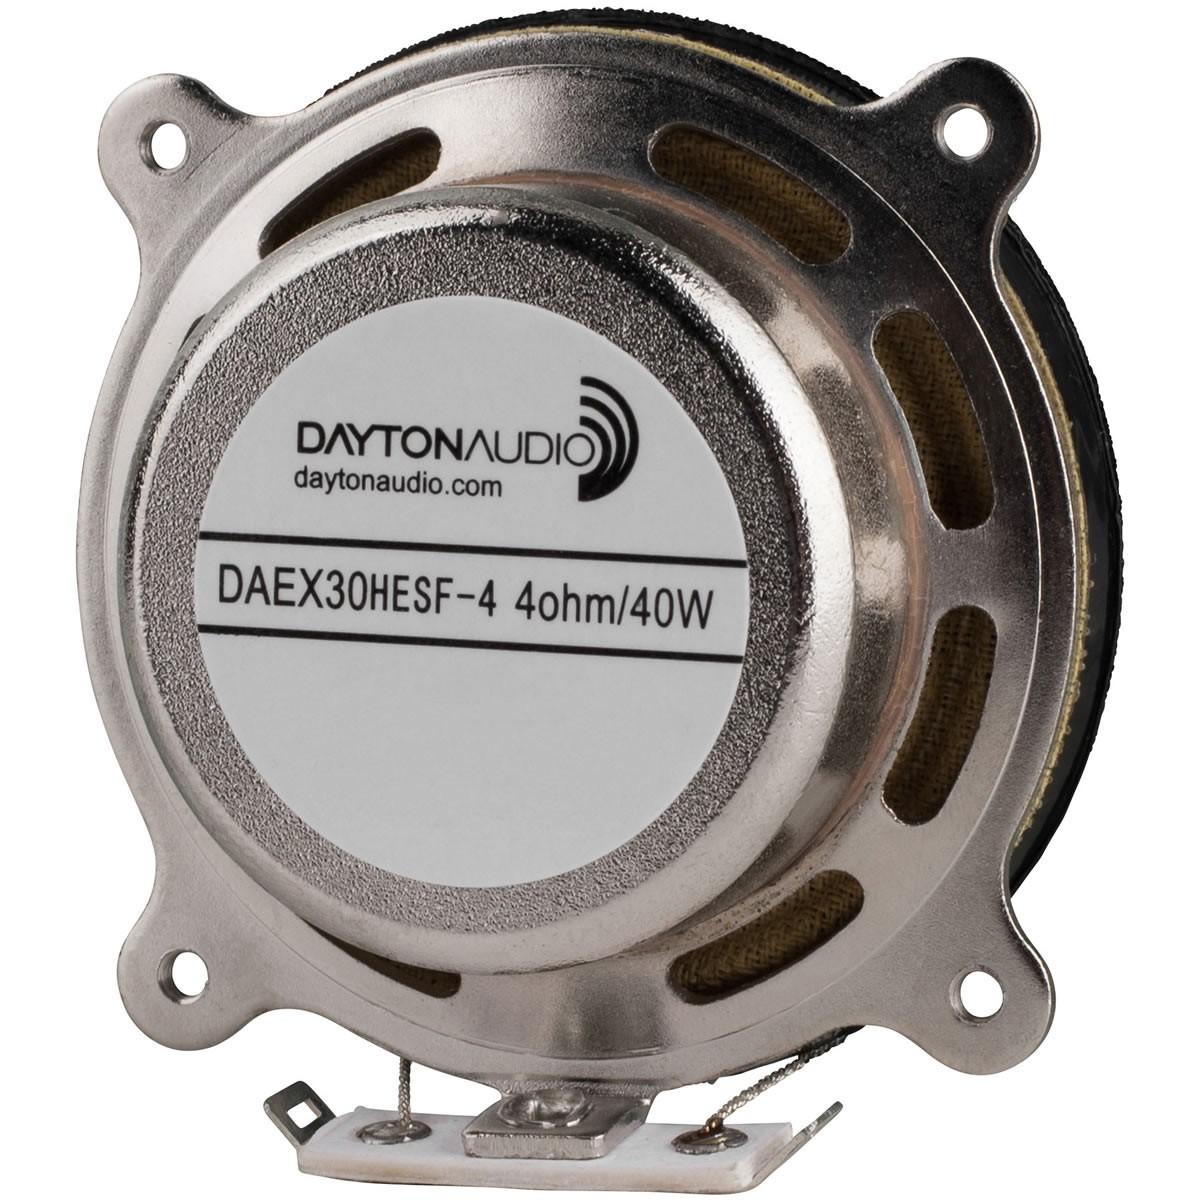 DAYTON AUDIO DAEX30HESF-4 Speaker Driver Exciter Bodyshaker